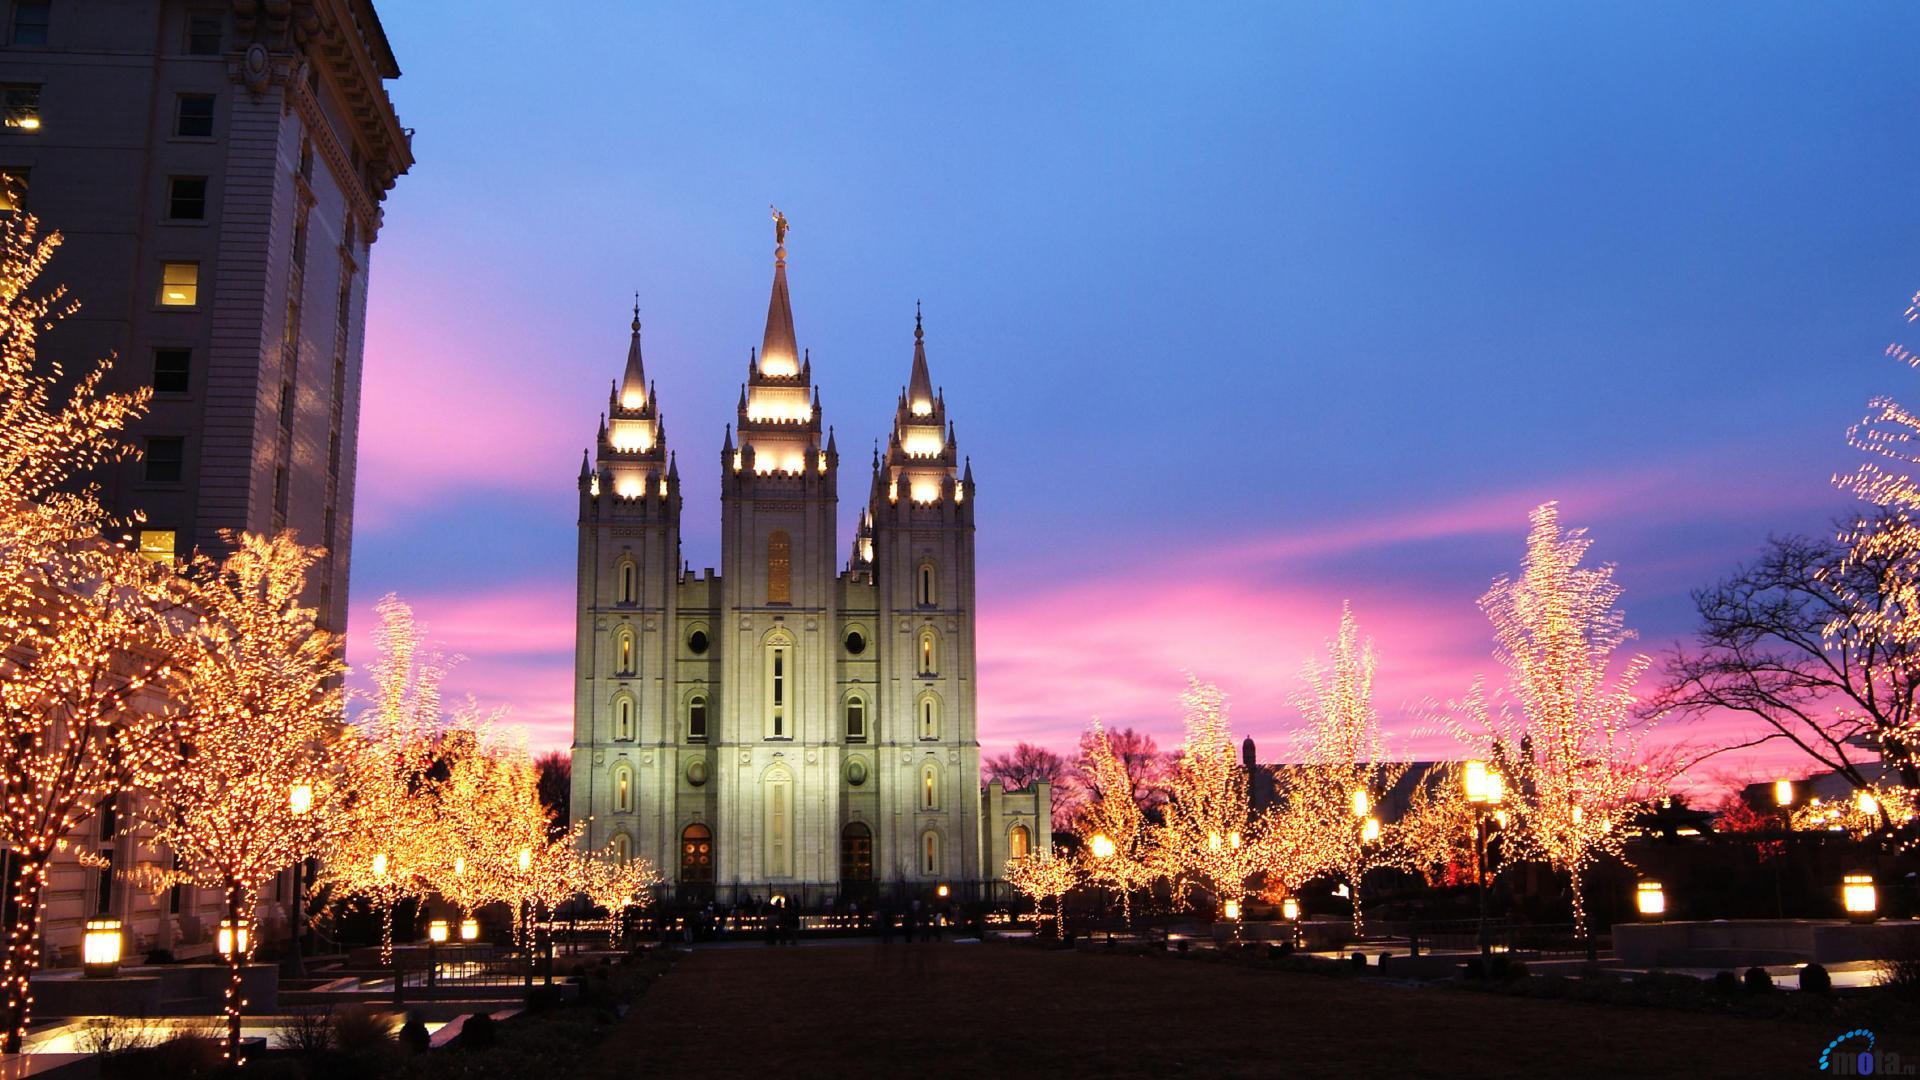 download Download Wallpaper Mormon Temple at Christmas Salt 1920x1080